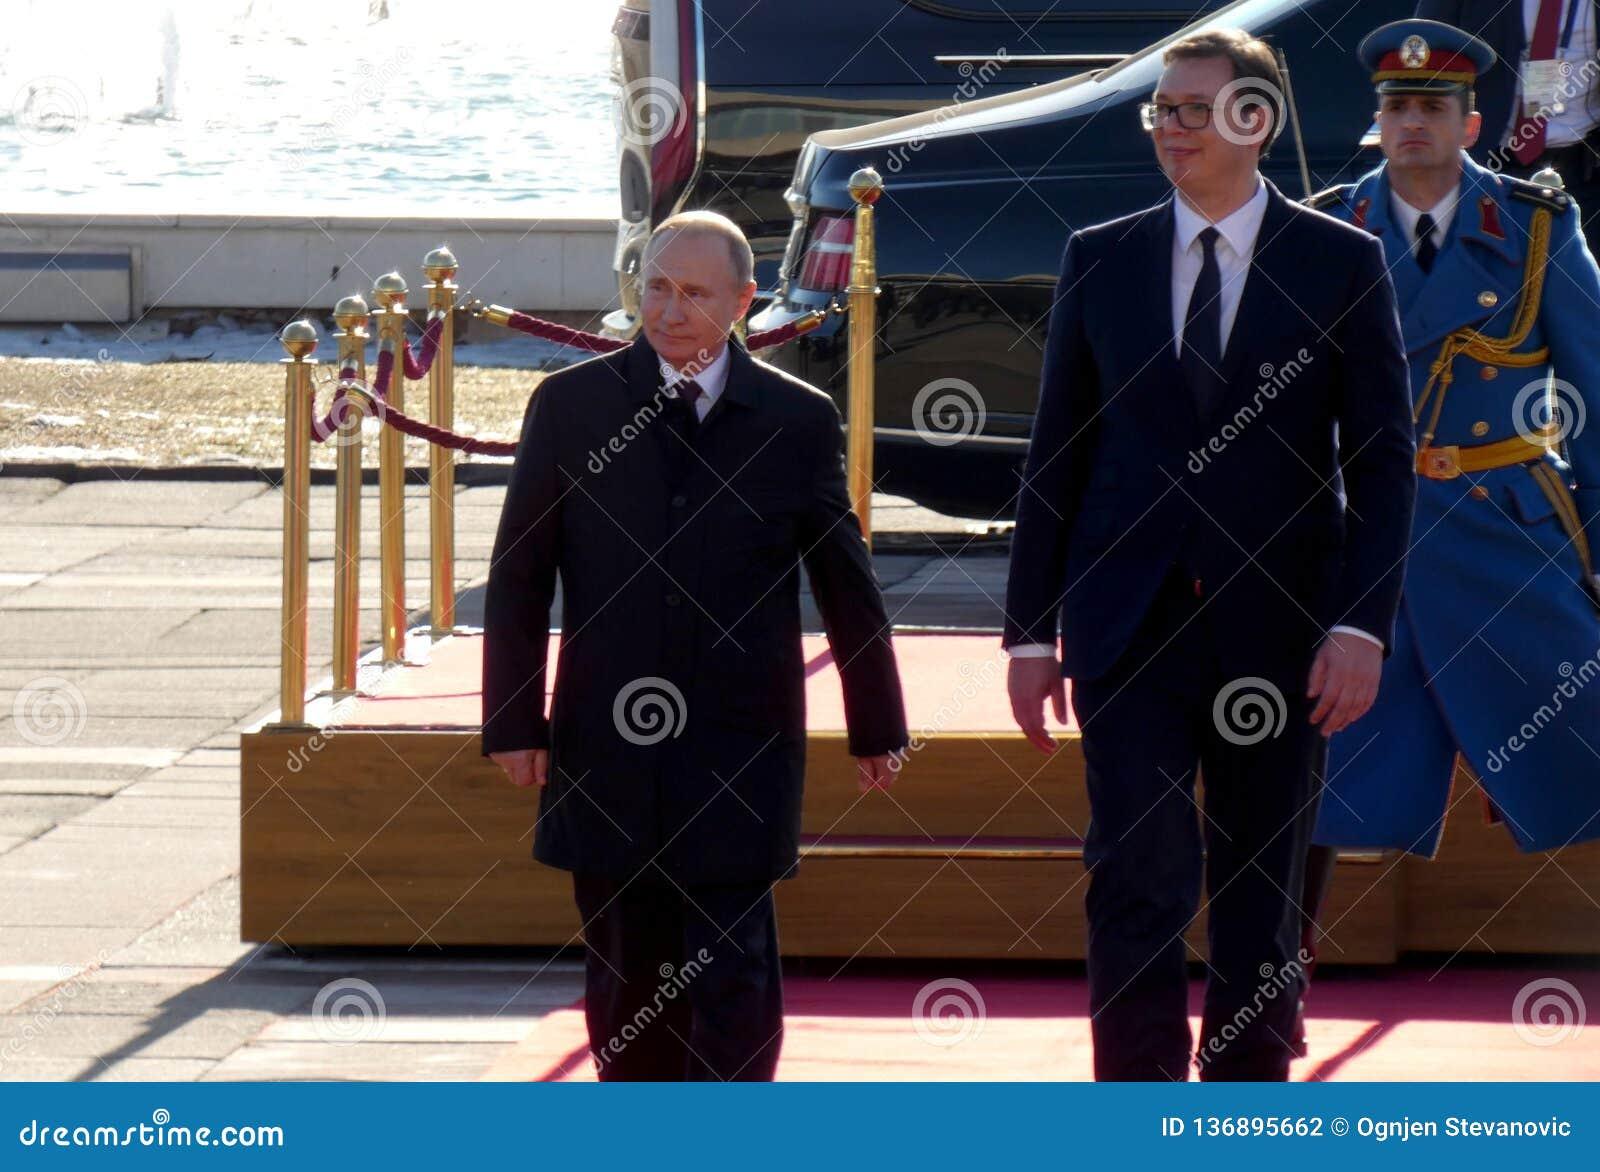 Belgrade, Serbia. January 17th 2019. President of Russian Federation, Vladimir Putin in official visit to Belgrade, Serbia.